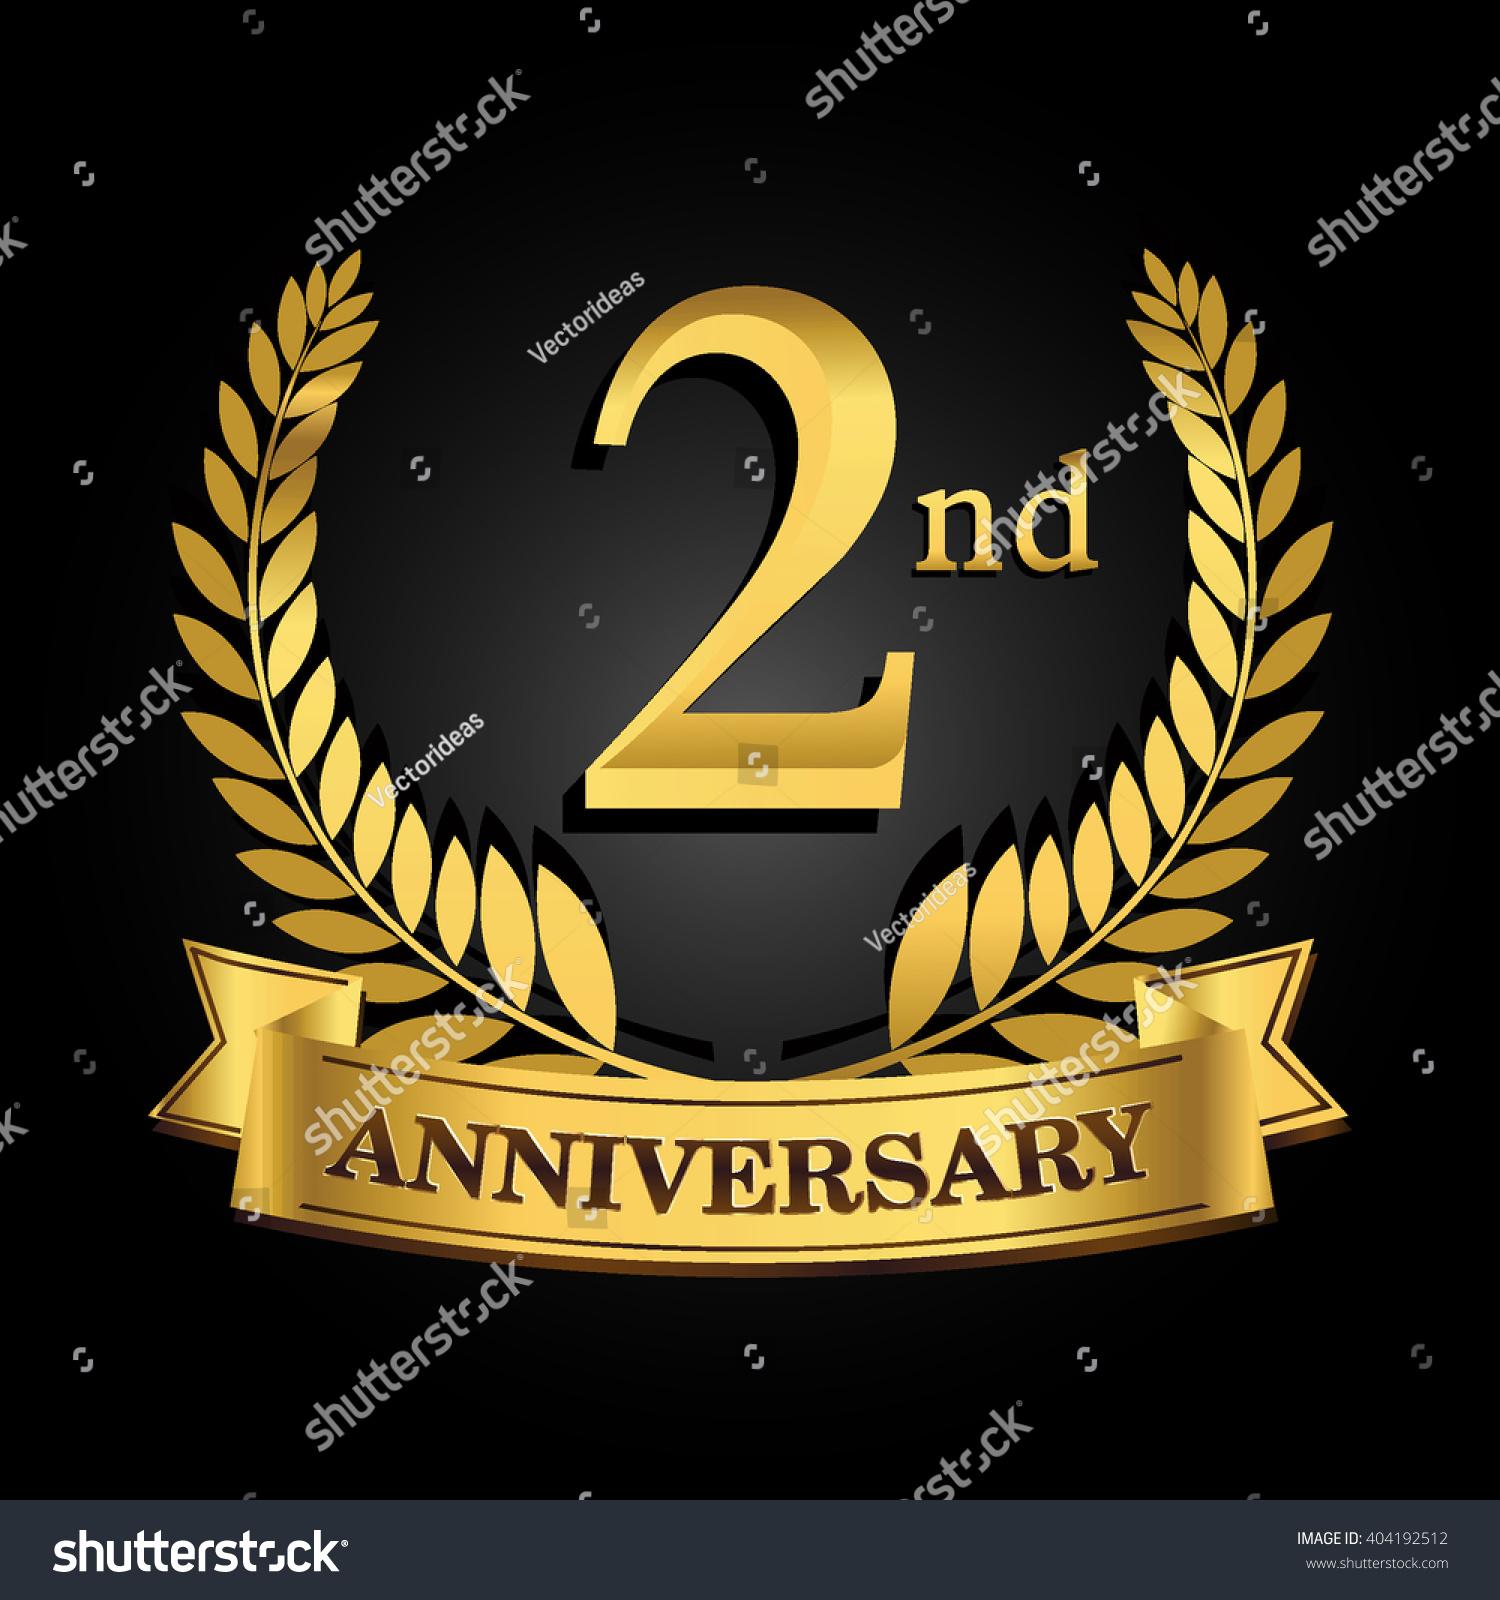 Nd golden anniversary logo ring ribbon stock vector